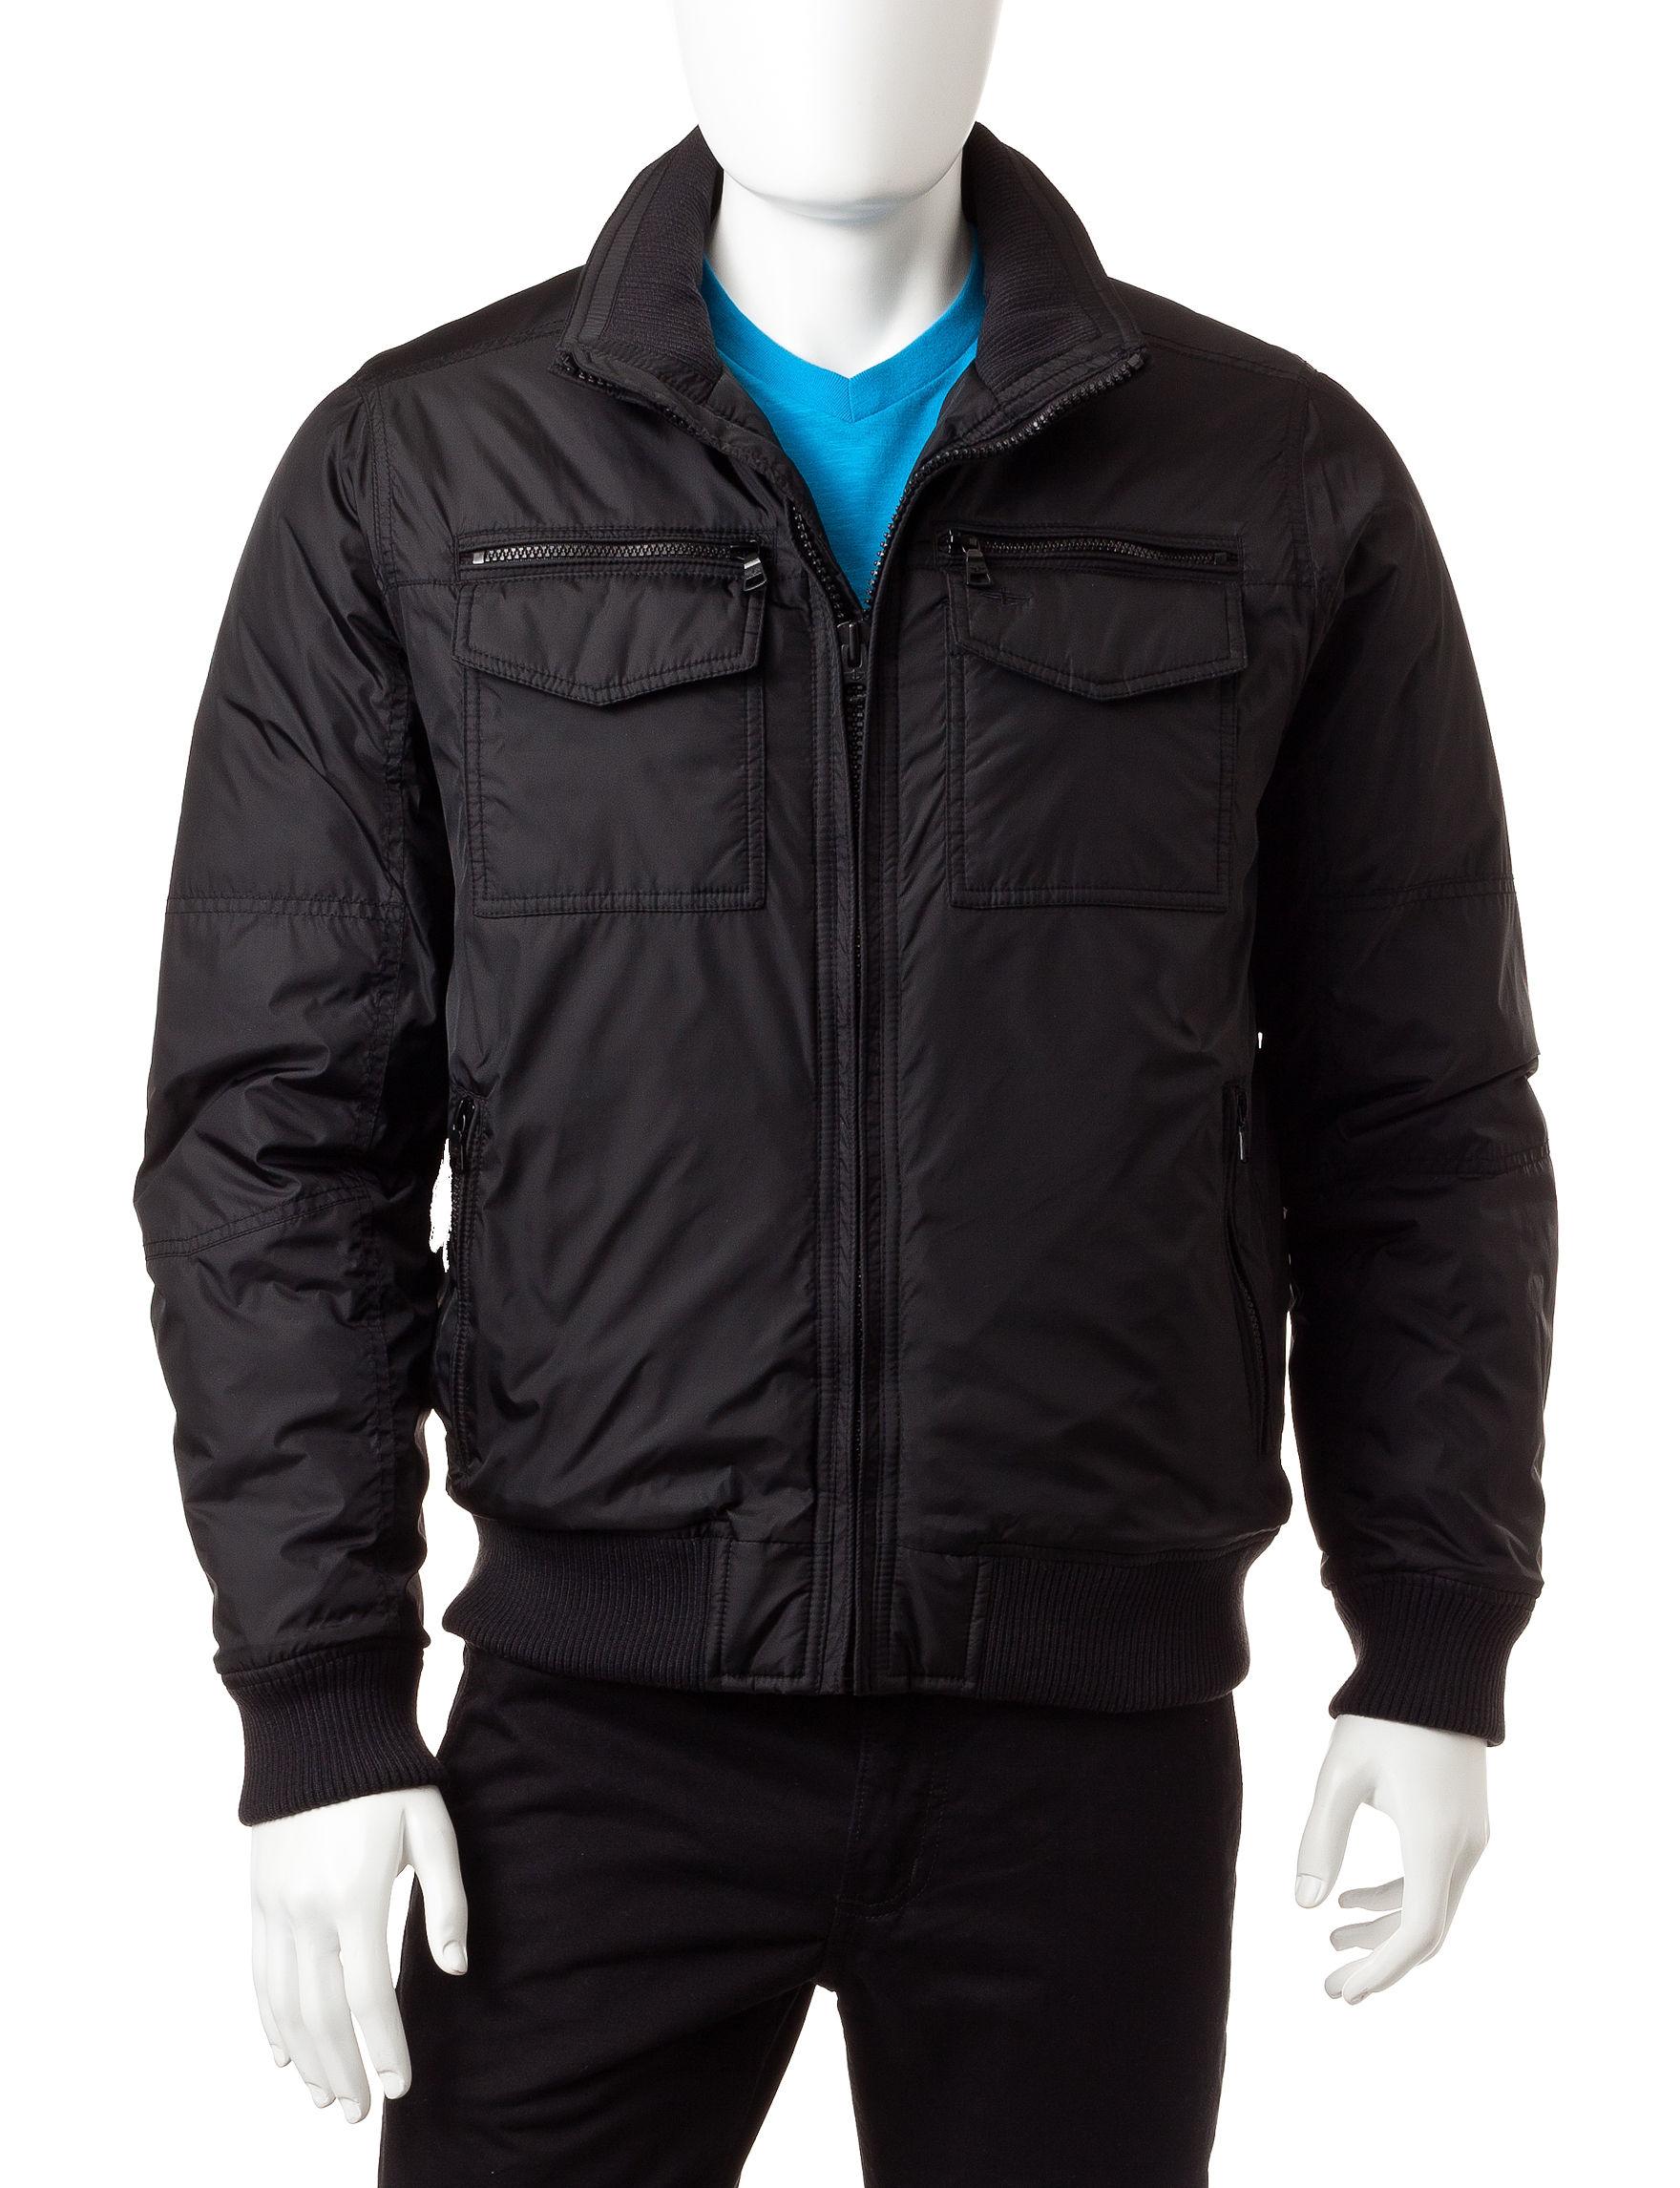 Dockers Black Fleece & Soft Shell Jackets